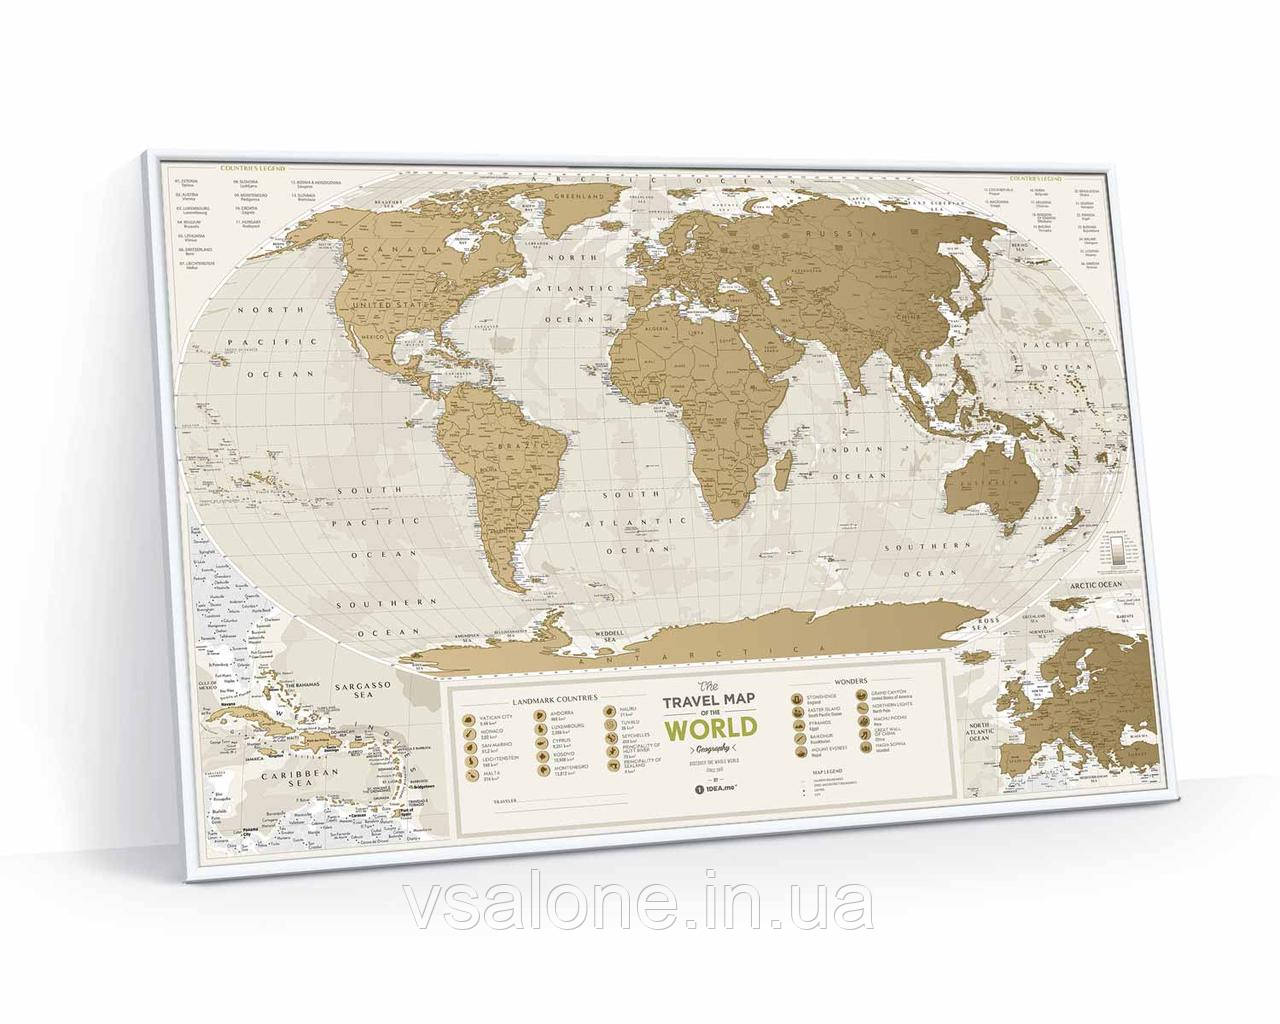 Скретч карта мира Travel Map Geography World (англ) (тубус)